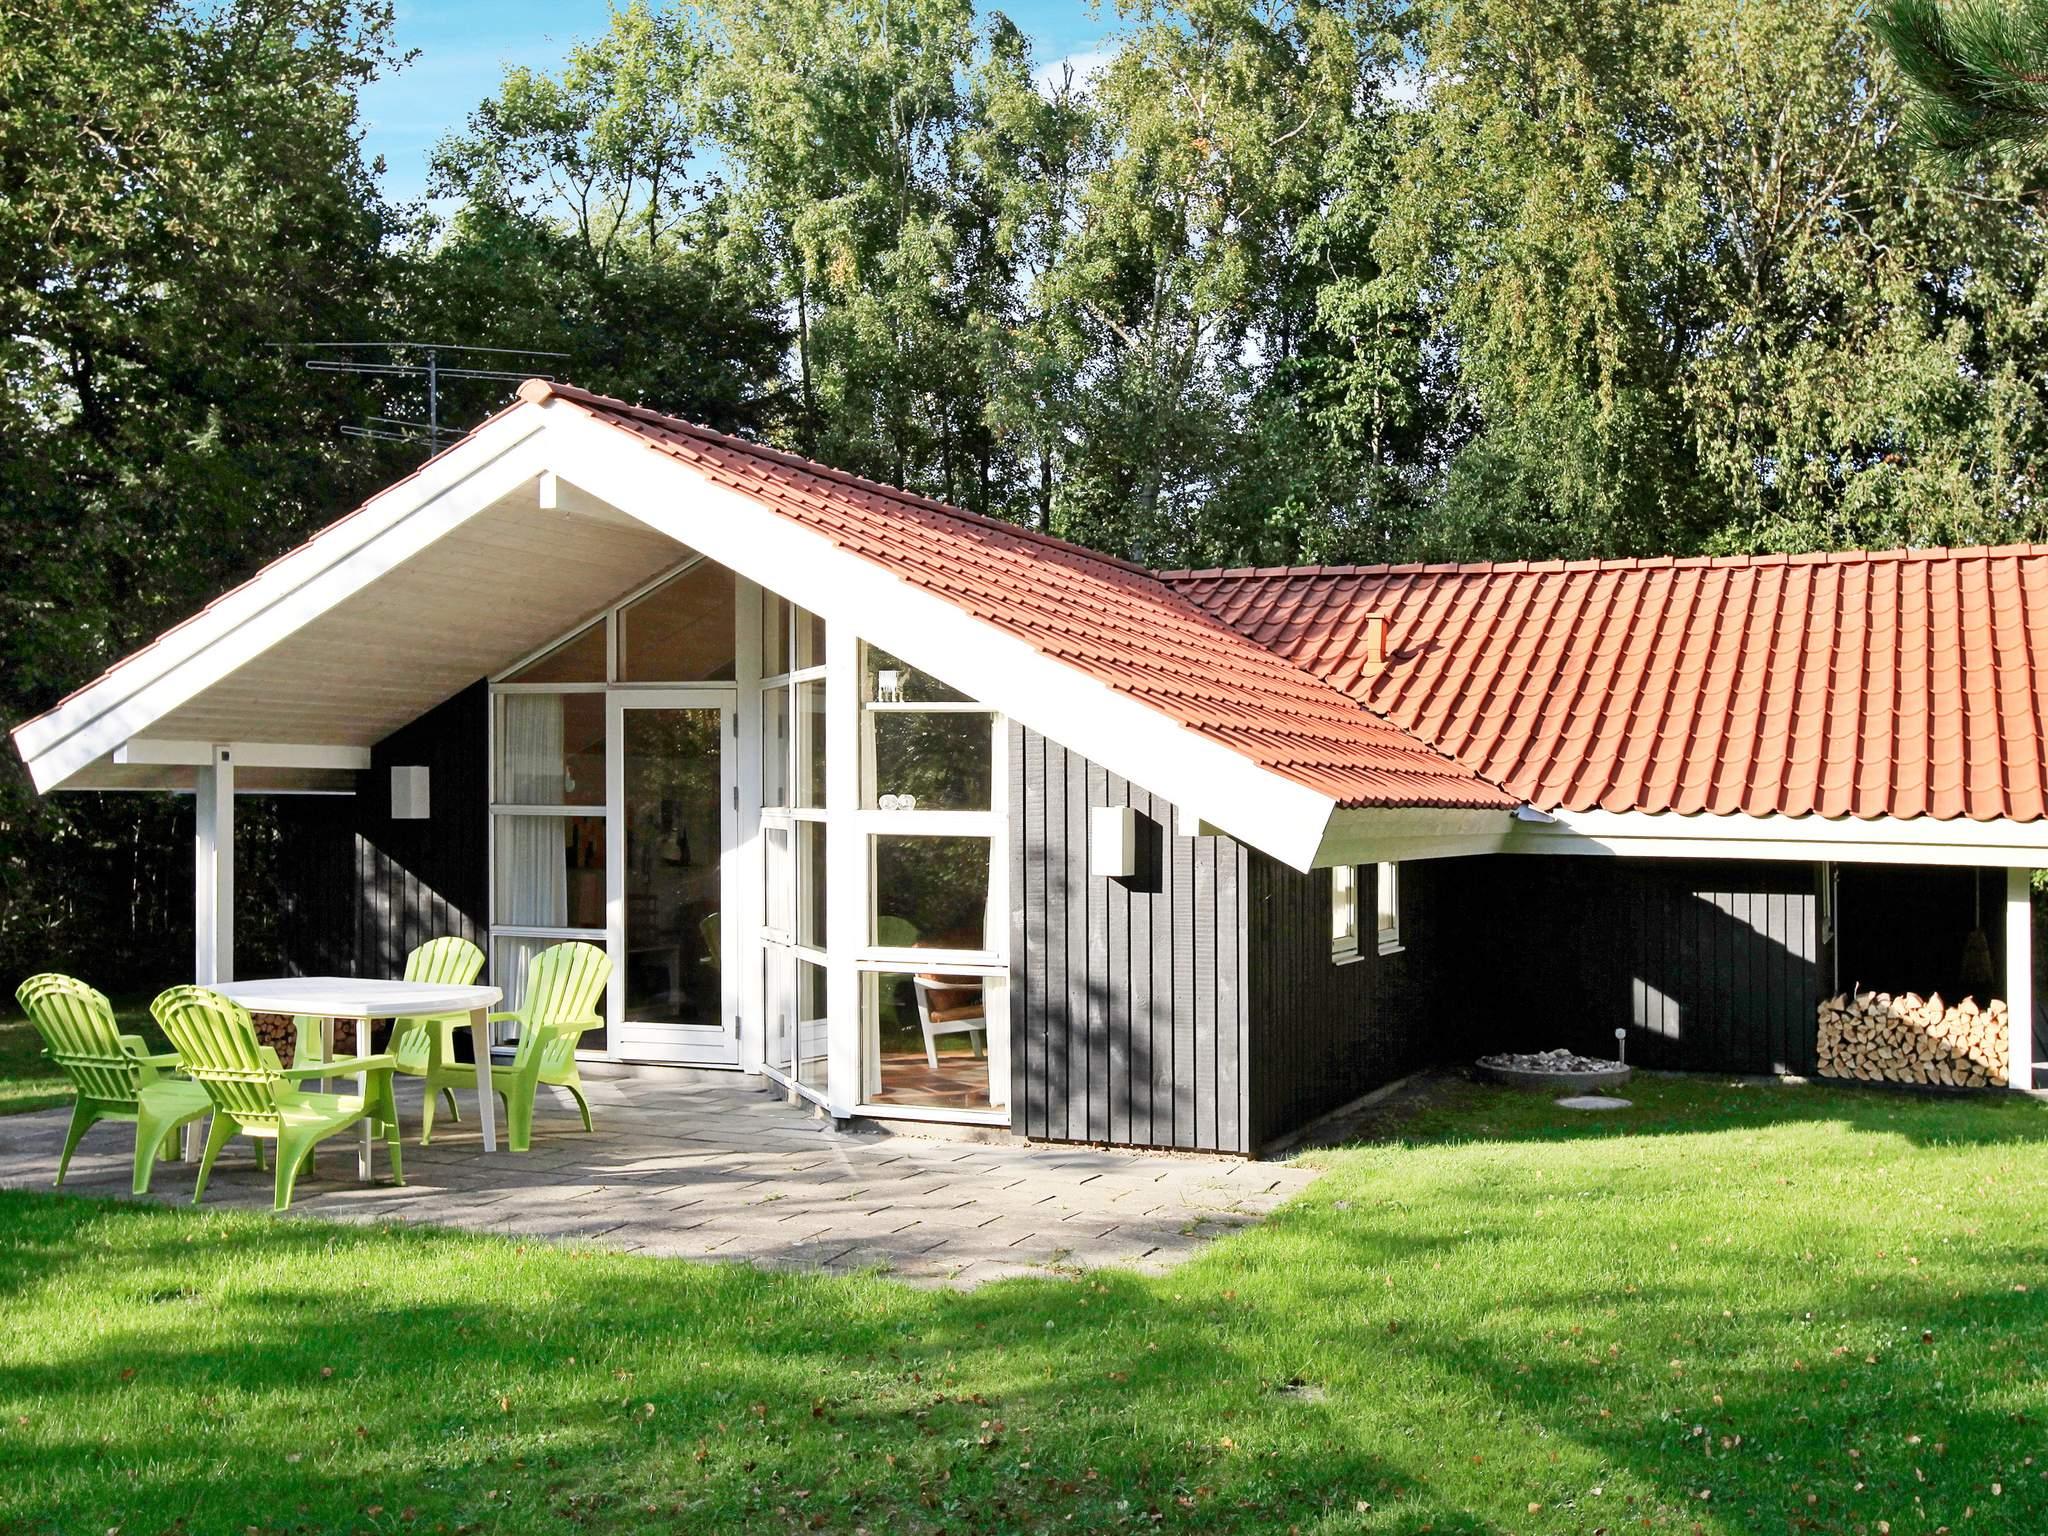 Ferienhaus Ristinge (160040), Ristinge, , Langeland, Dänemark, Bild 1